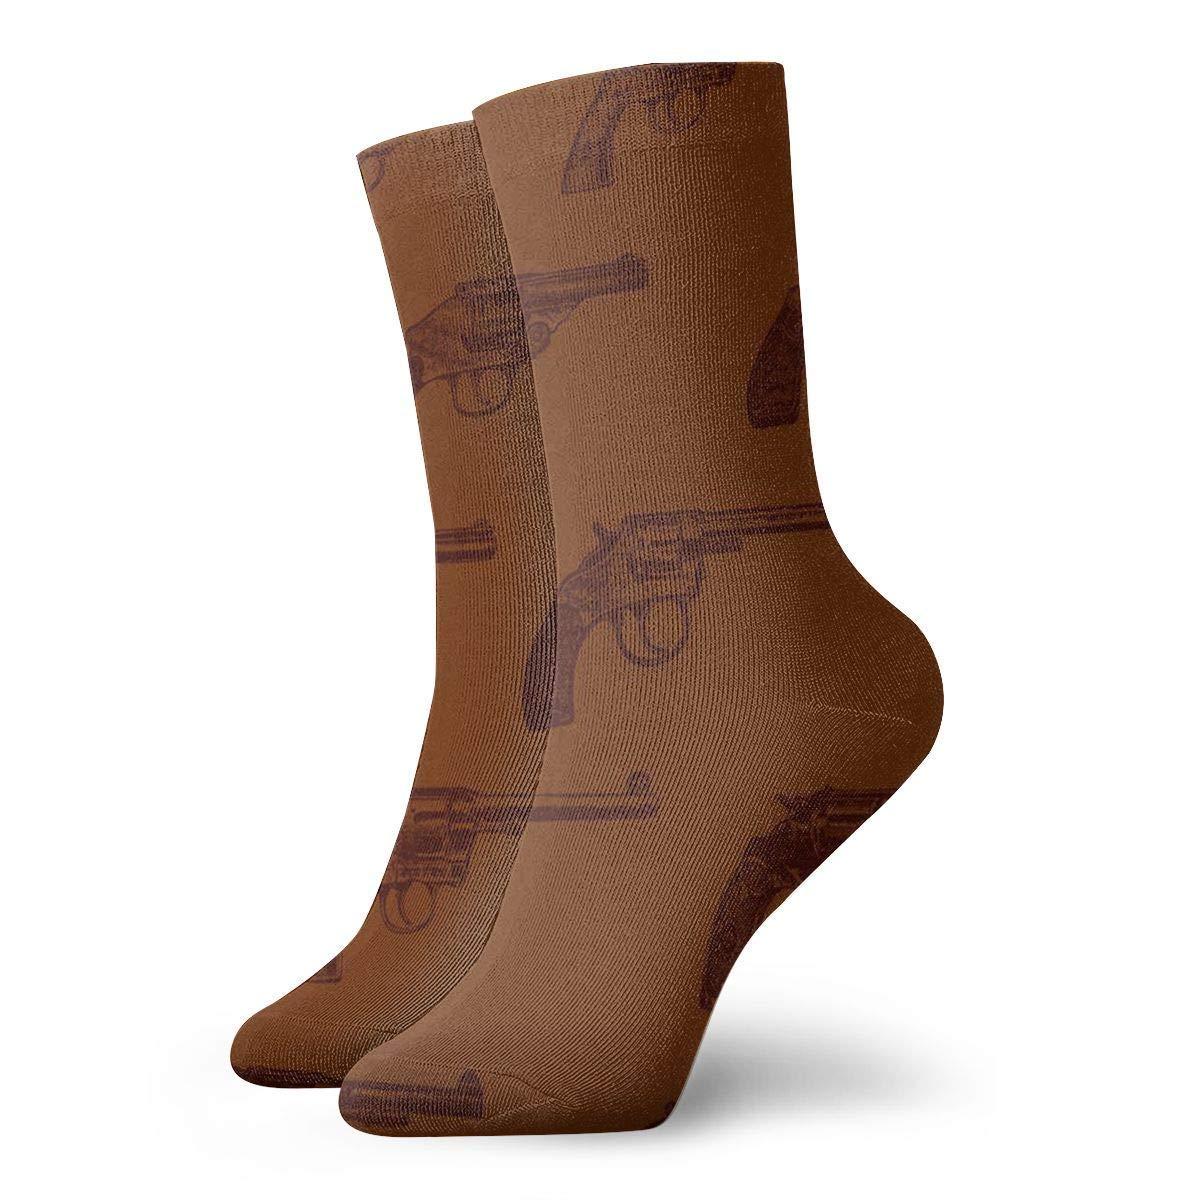 Western Revolvers Men Women Novelty Funny Crazy Crew Sock Printed Sport Athletic Socks 30cm Long Personalized Gift Socks Hipiyoled